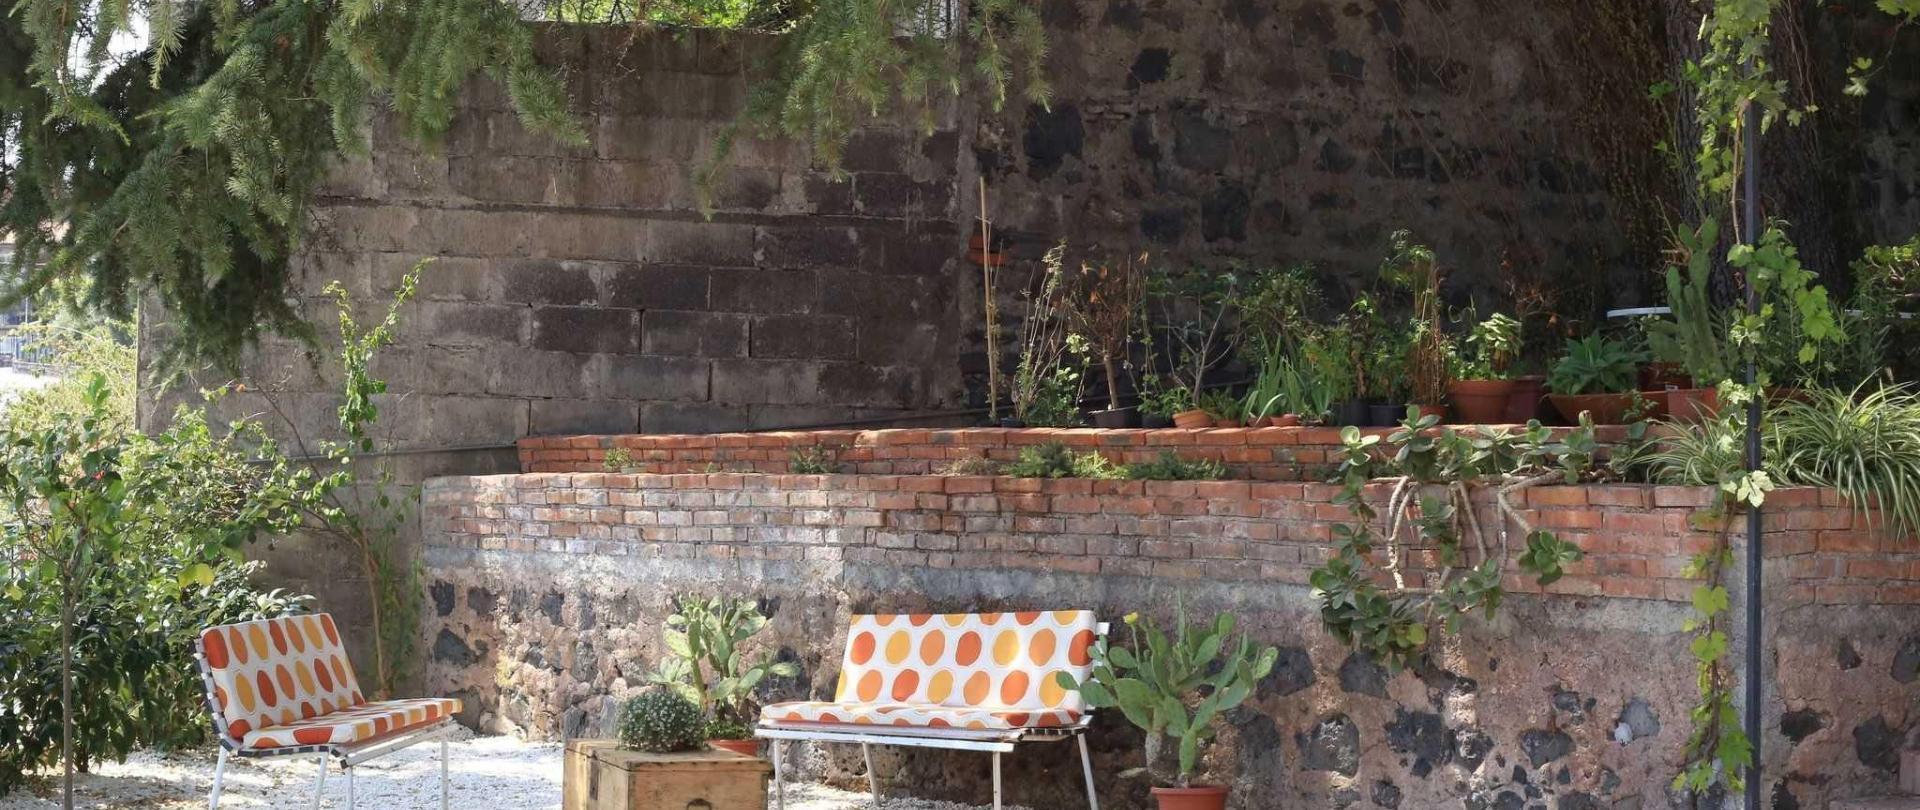 giardino-sedili-pois.jpg